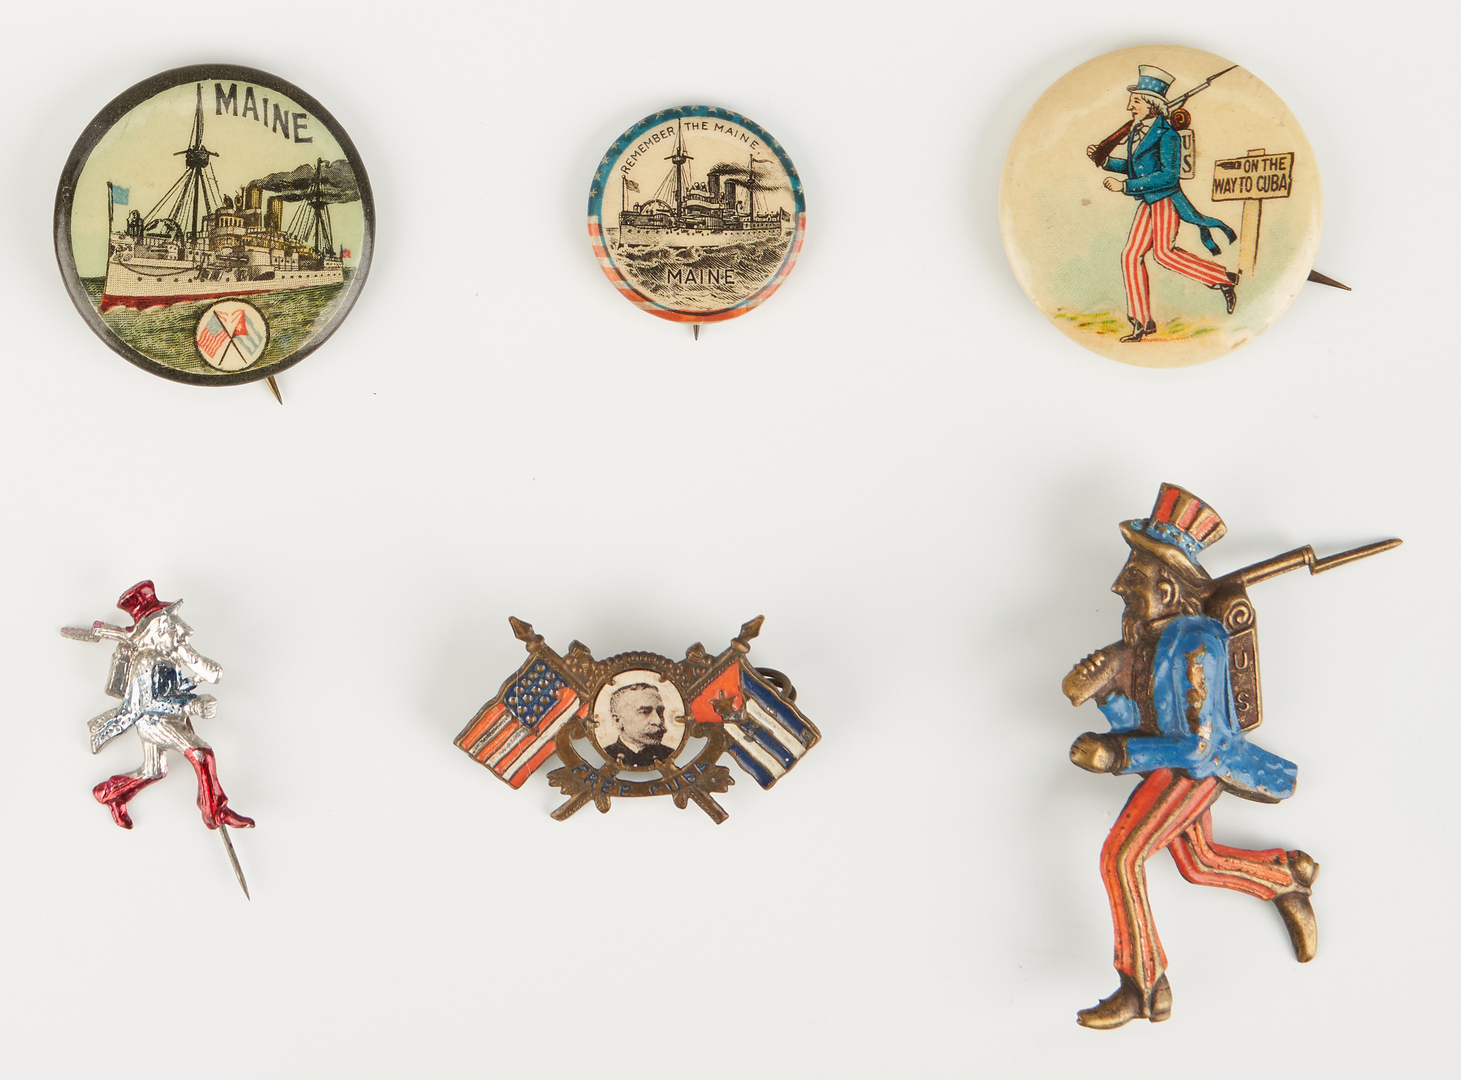 Lot 661: 19 Spanish-American War Ephemera Items, incl. Buttons